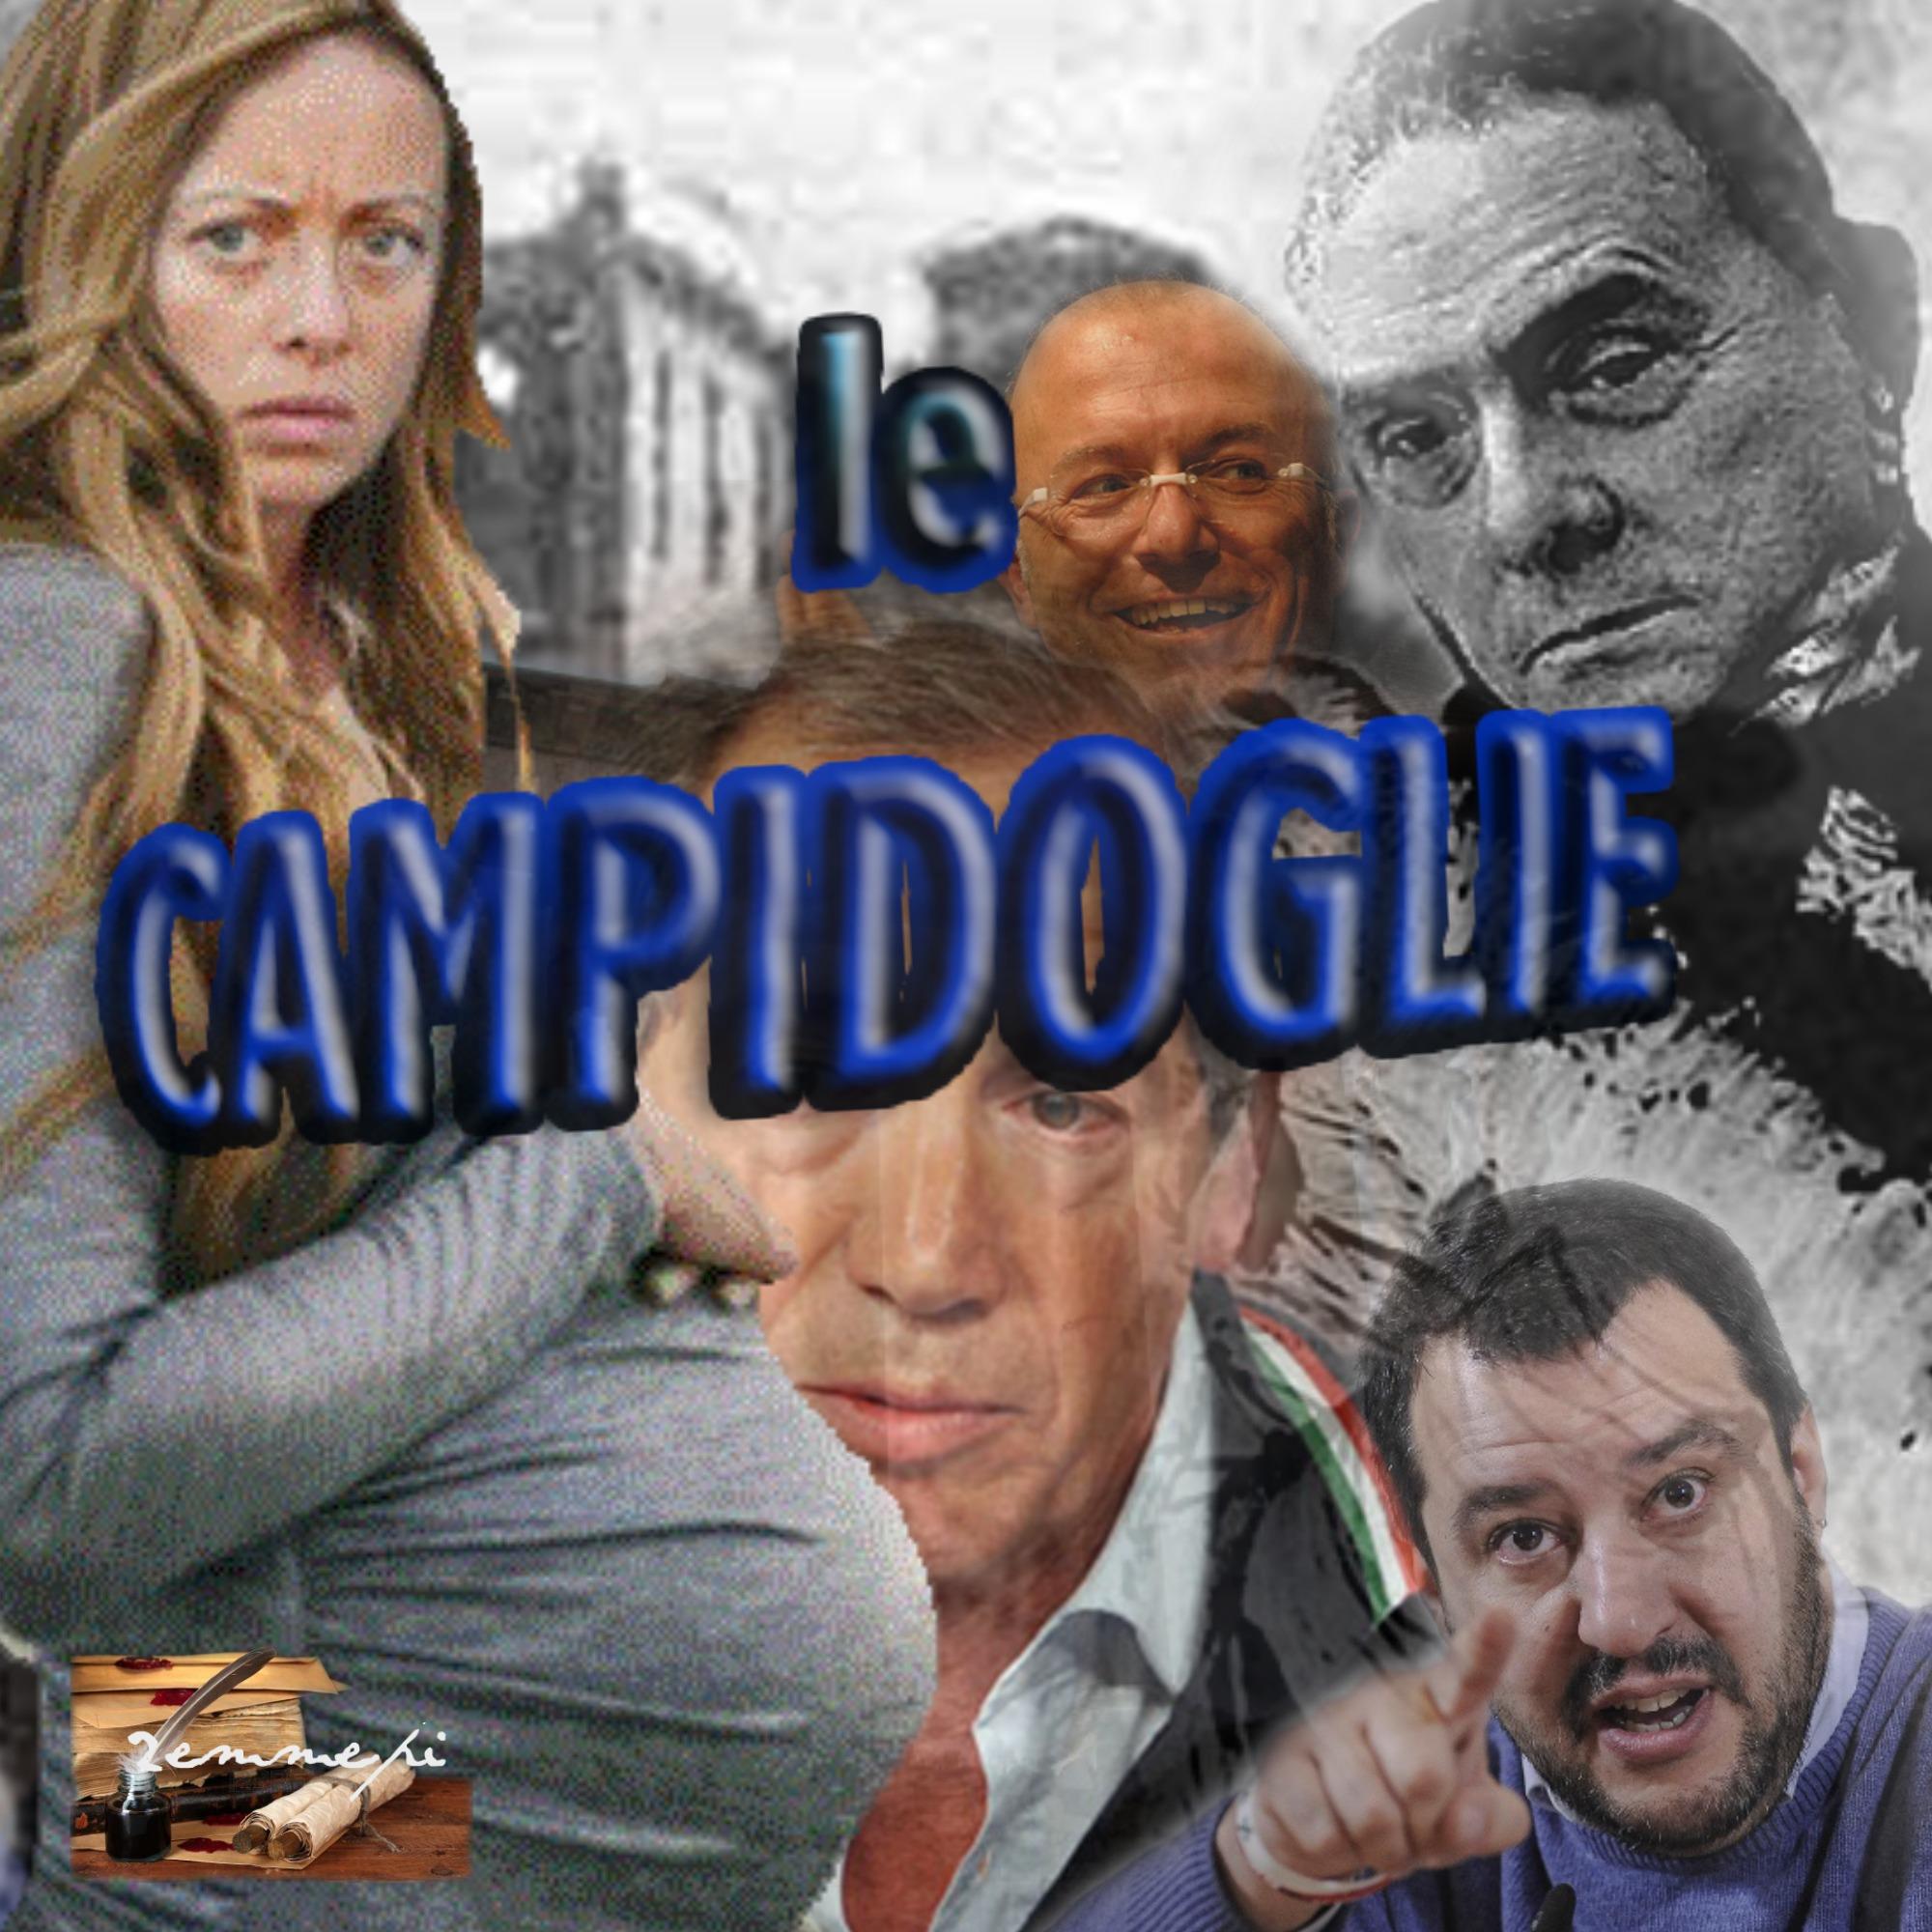 1-LE CAMPIDOGLIE